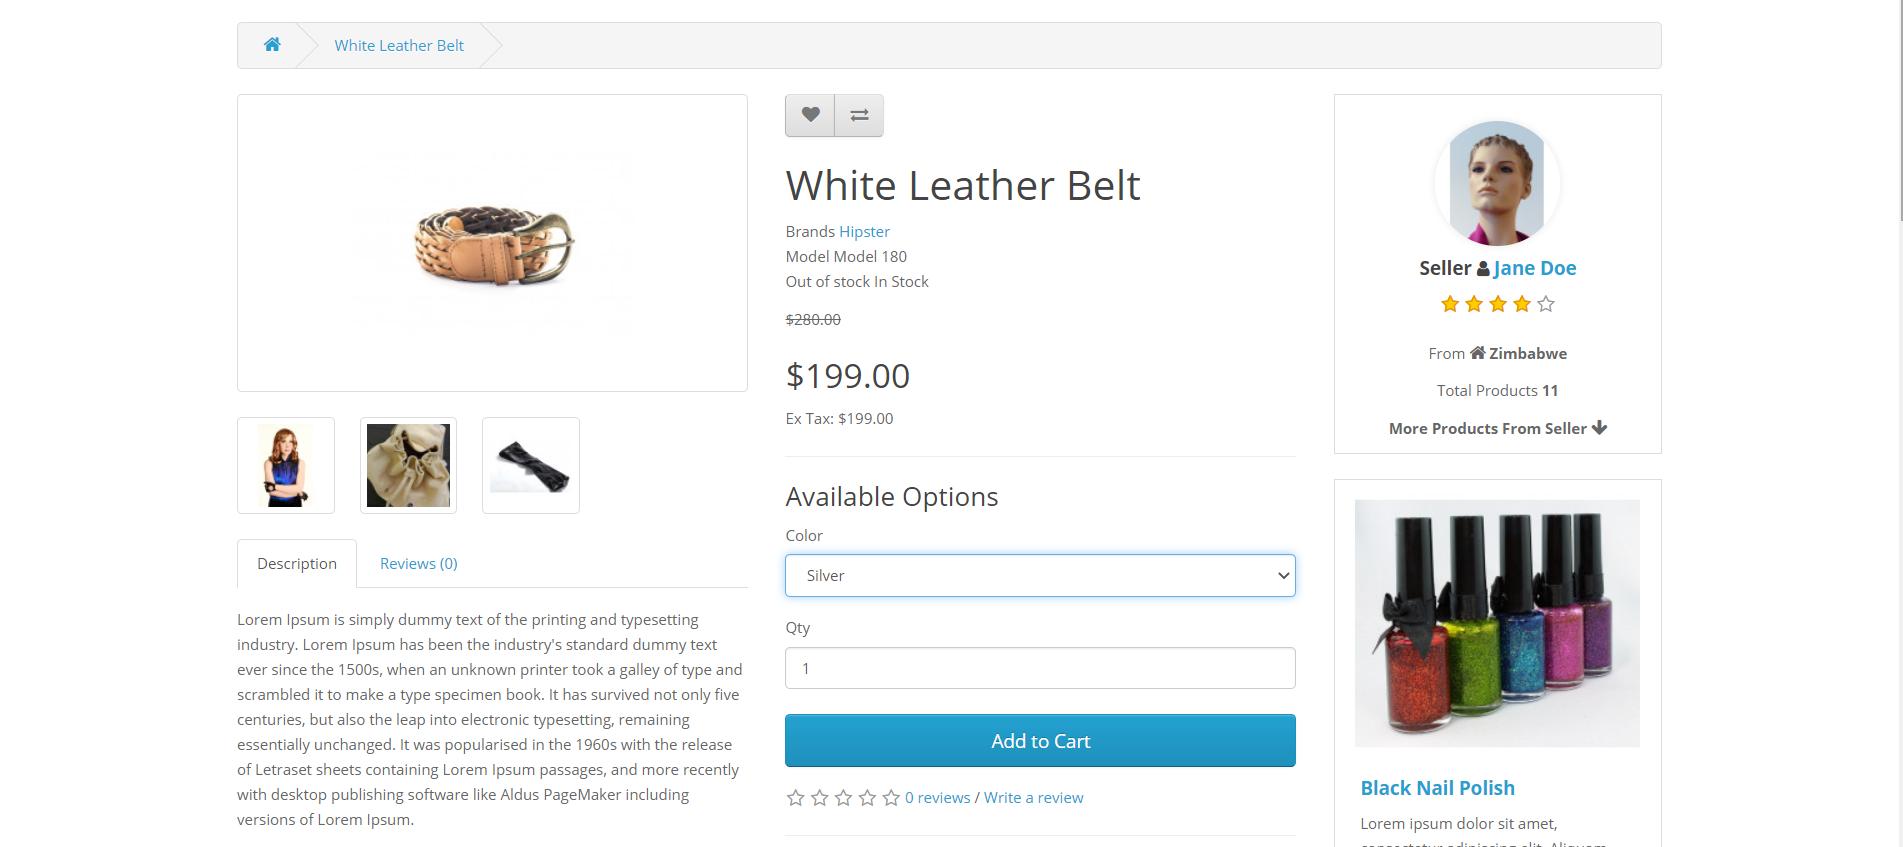 https-oc-webkul-com-paypal-commerce-product-White-Leather-Belt-html